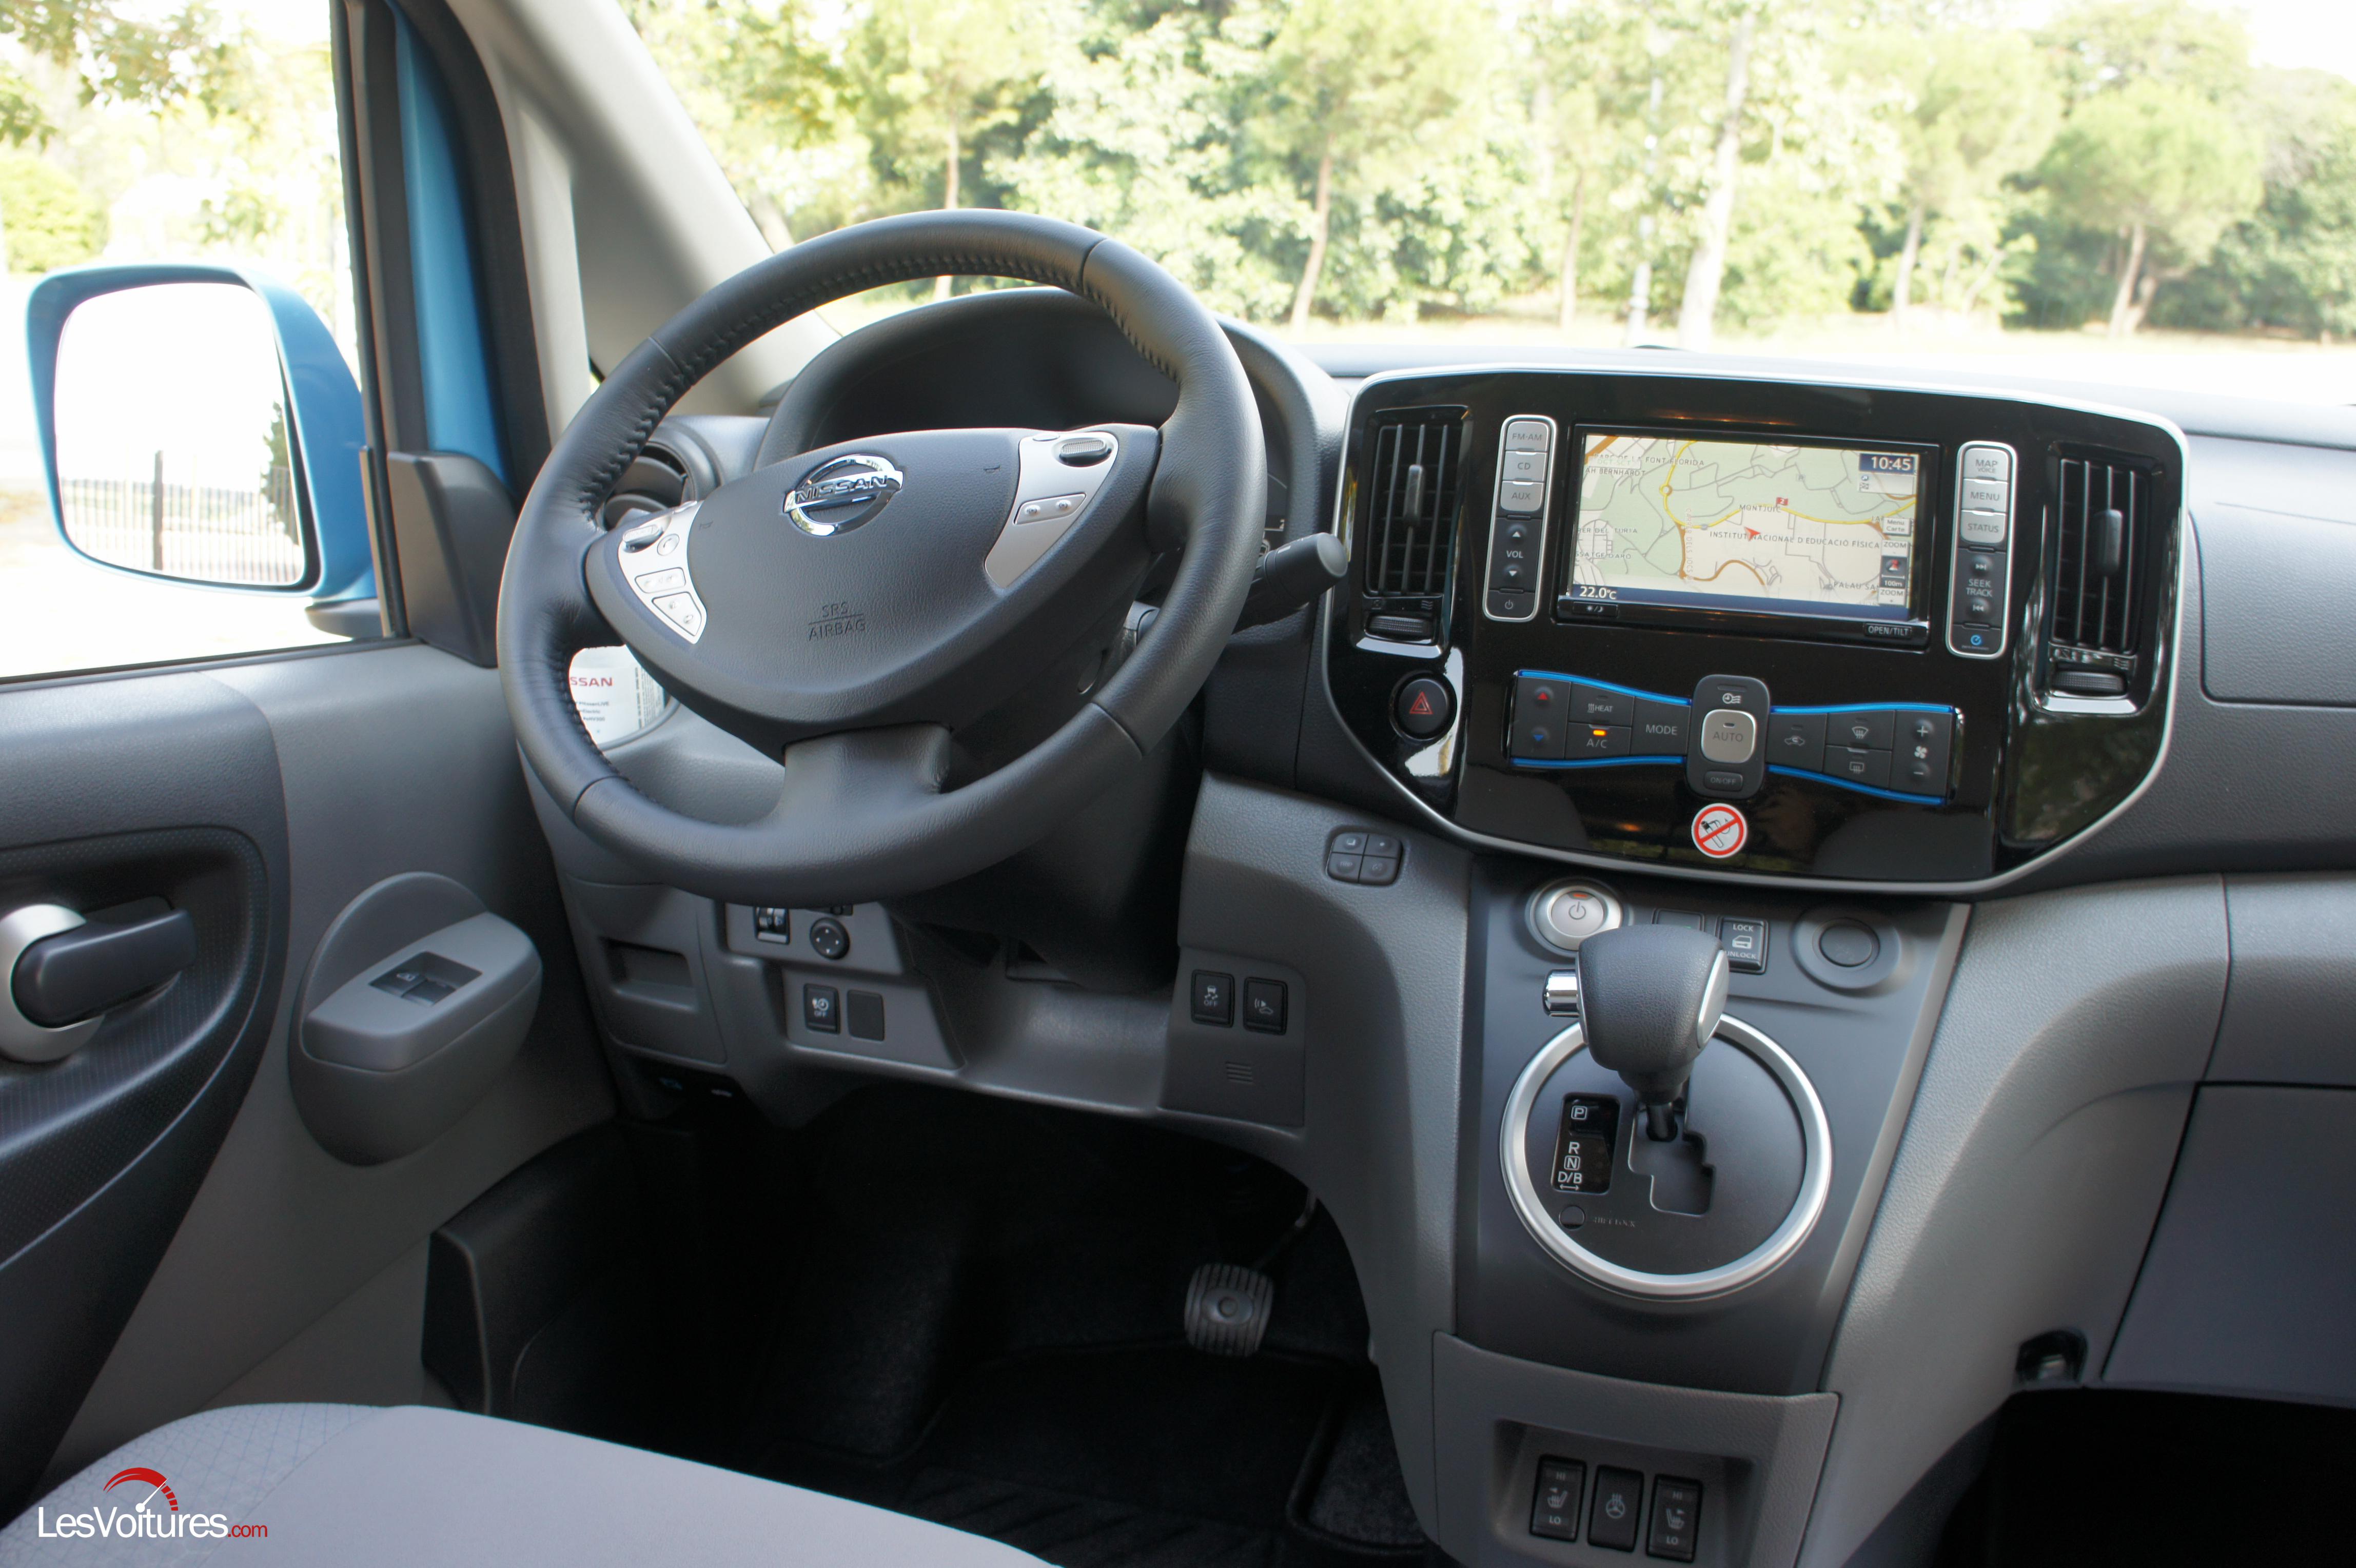 Nissan E Nv Fourgon Evalia Ludospace C A Lectrique on Fiat Car Race